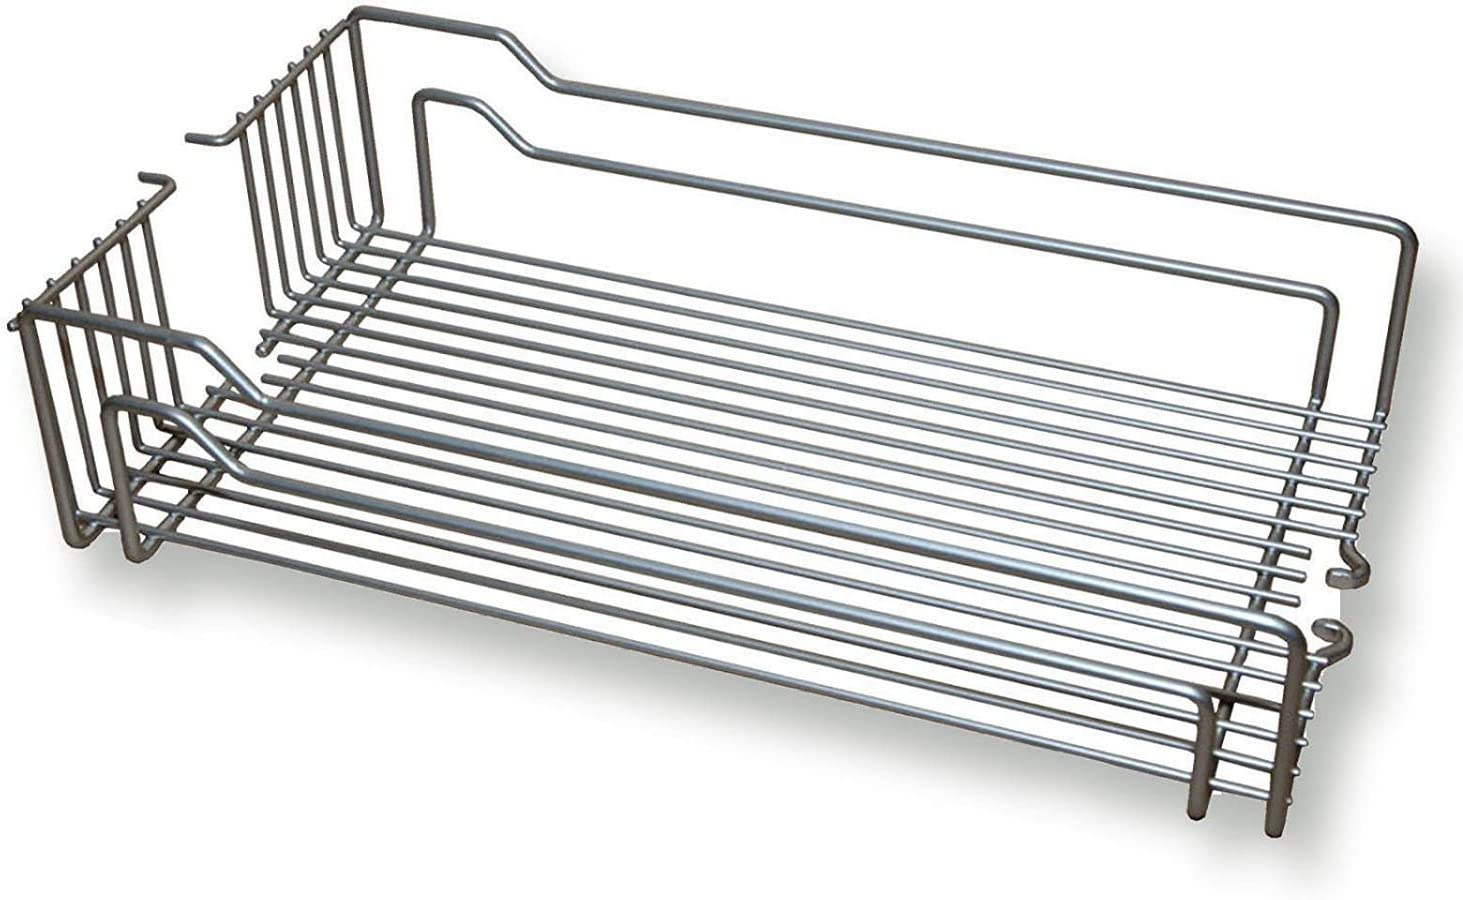 Colgado Cesta 250 x 467 x 110 mm para el Sistema de Almacenaje Dispensa de Kesseb/öhmer Cesta Met/álica para Mueble de 30